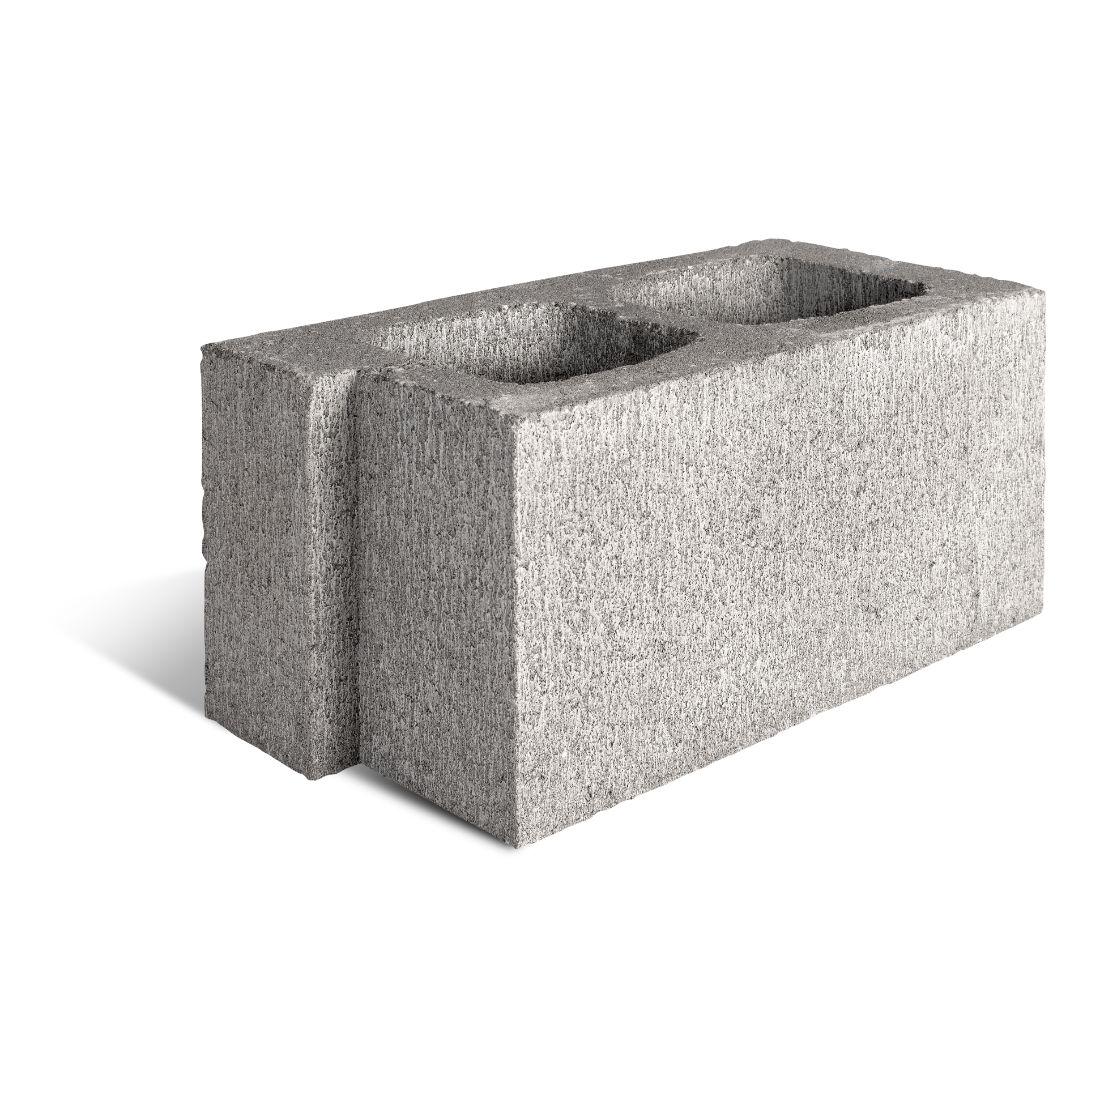 20.09 Rebate Whole Block 390x190x190mm